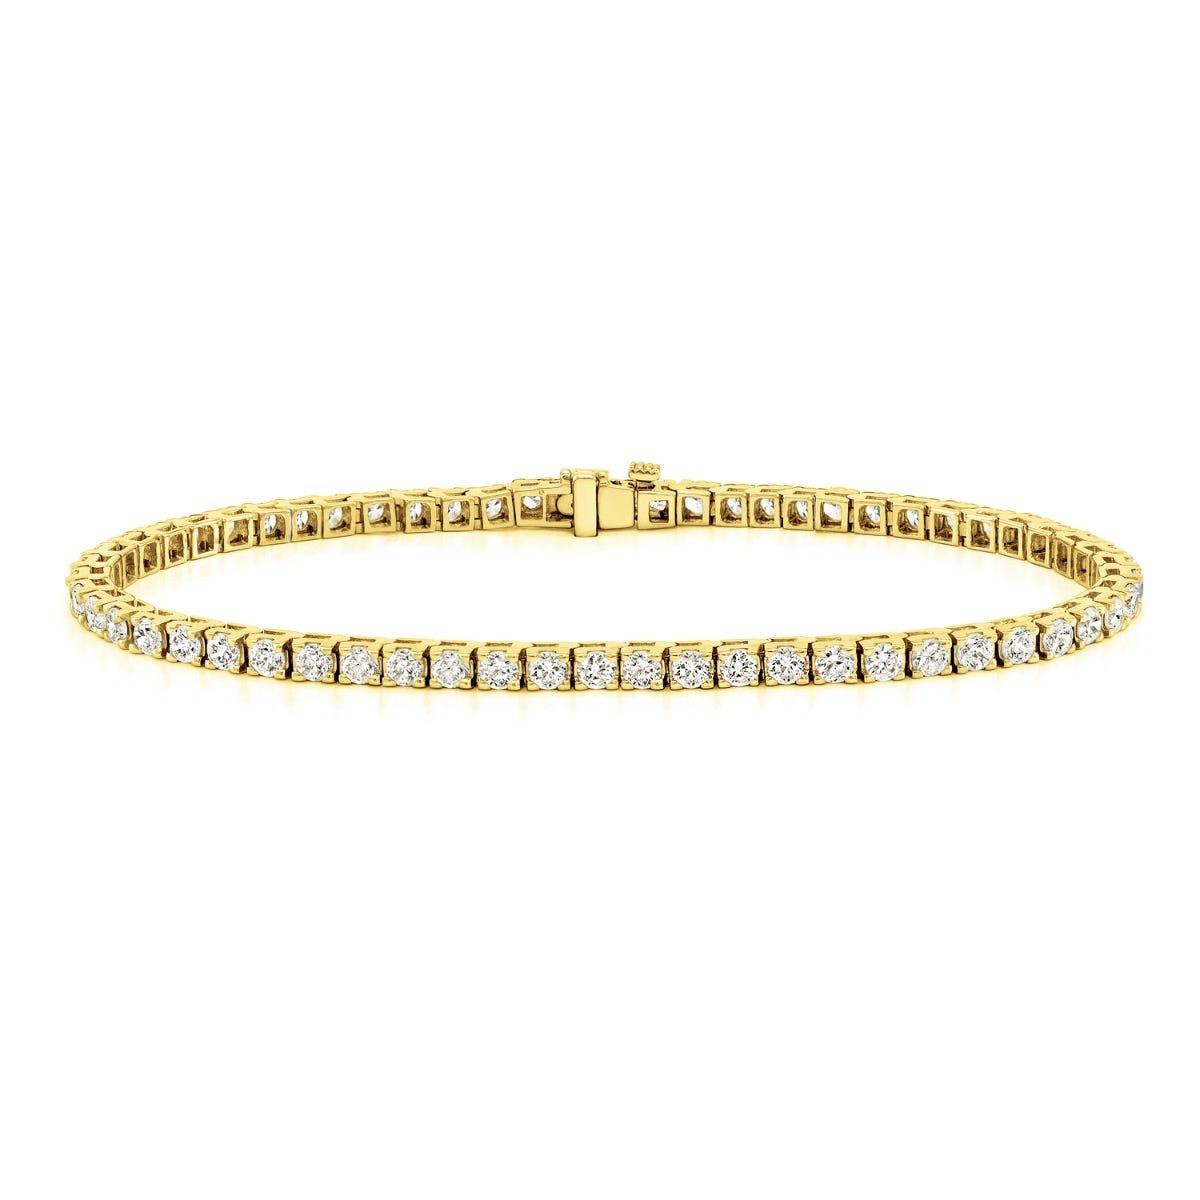 1.50ctw. 4-Prong Square Link Diamond Tennis Bracelet in 14K Yellow Gold (JK, I2-I3)